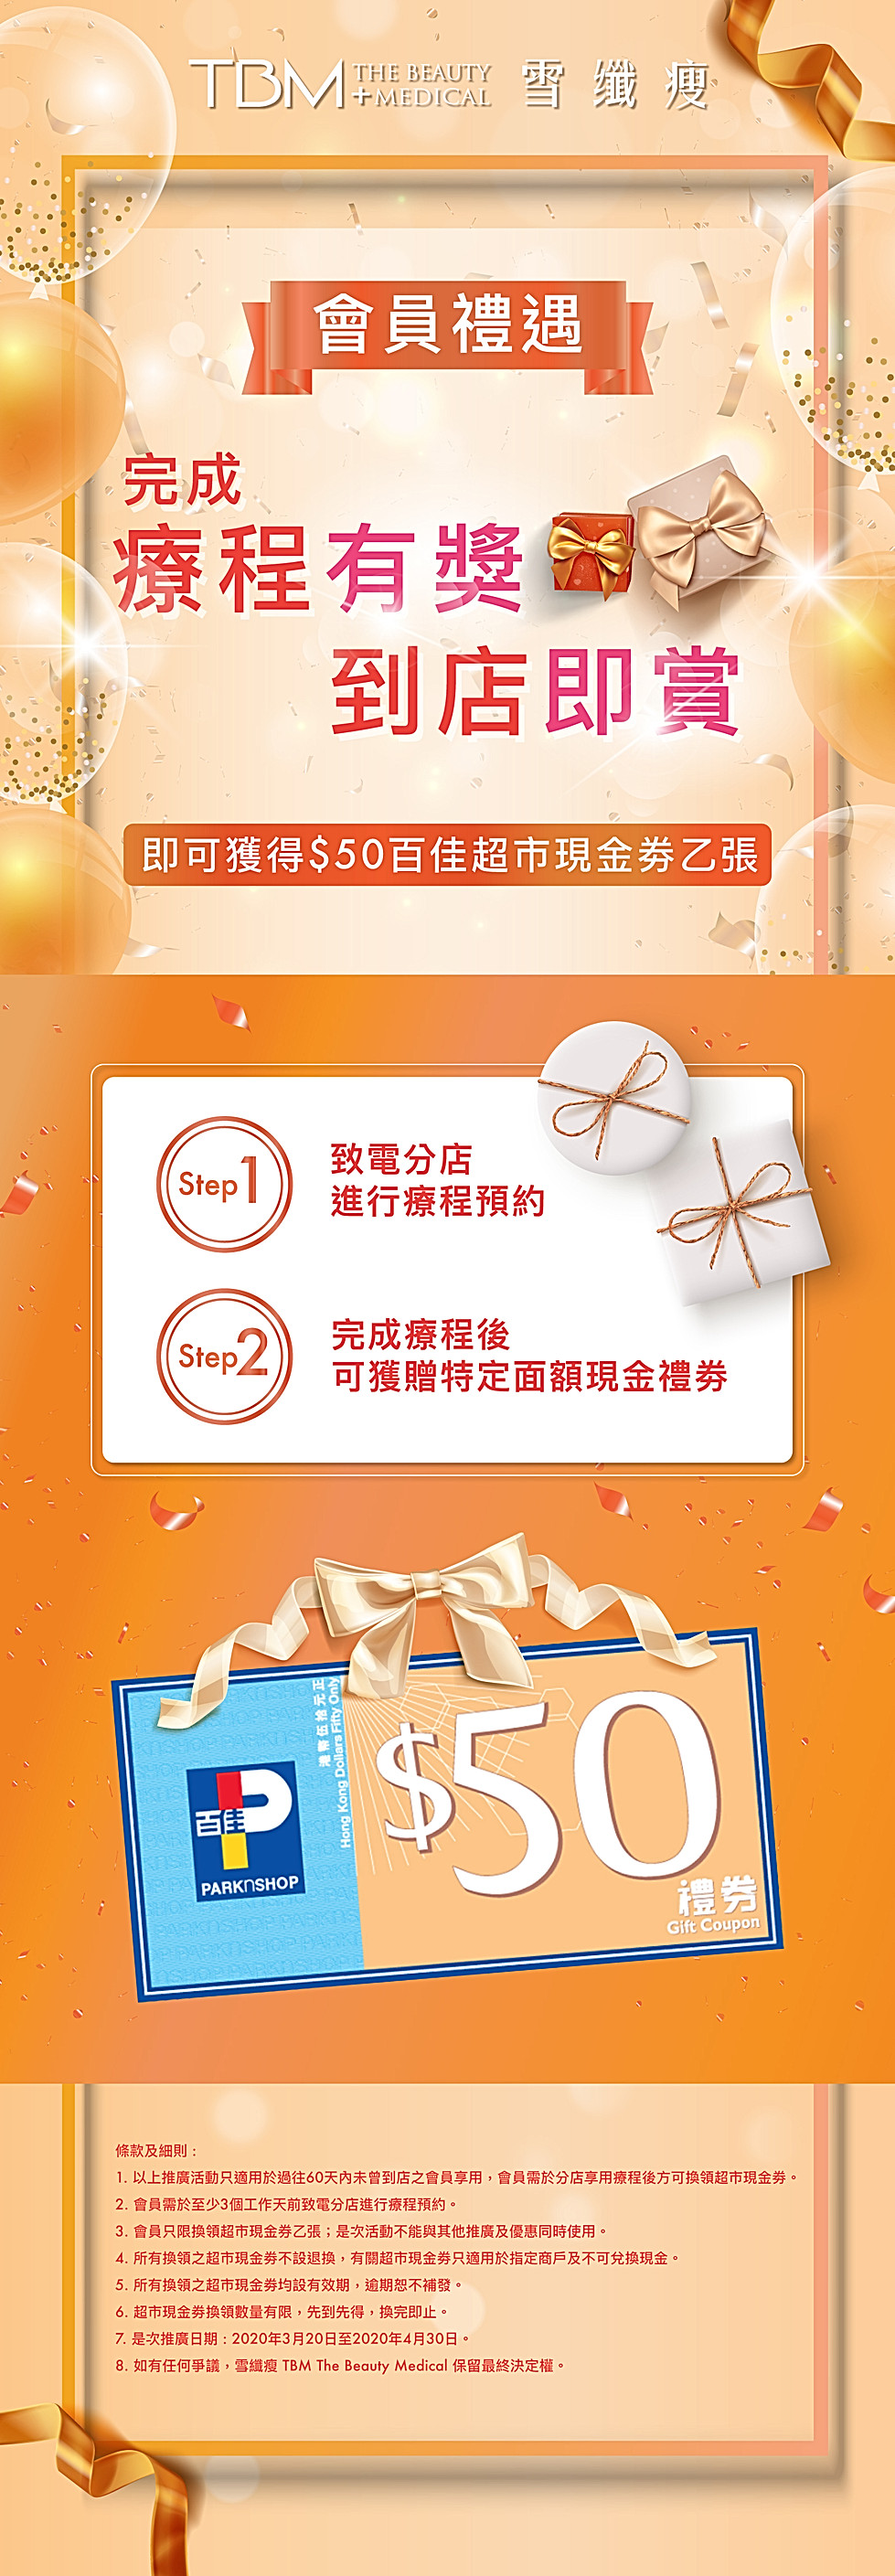 Phone Version_$50百佳現金券 2020-03-20-2-01.j